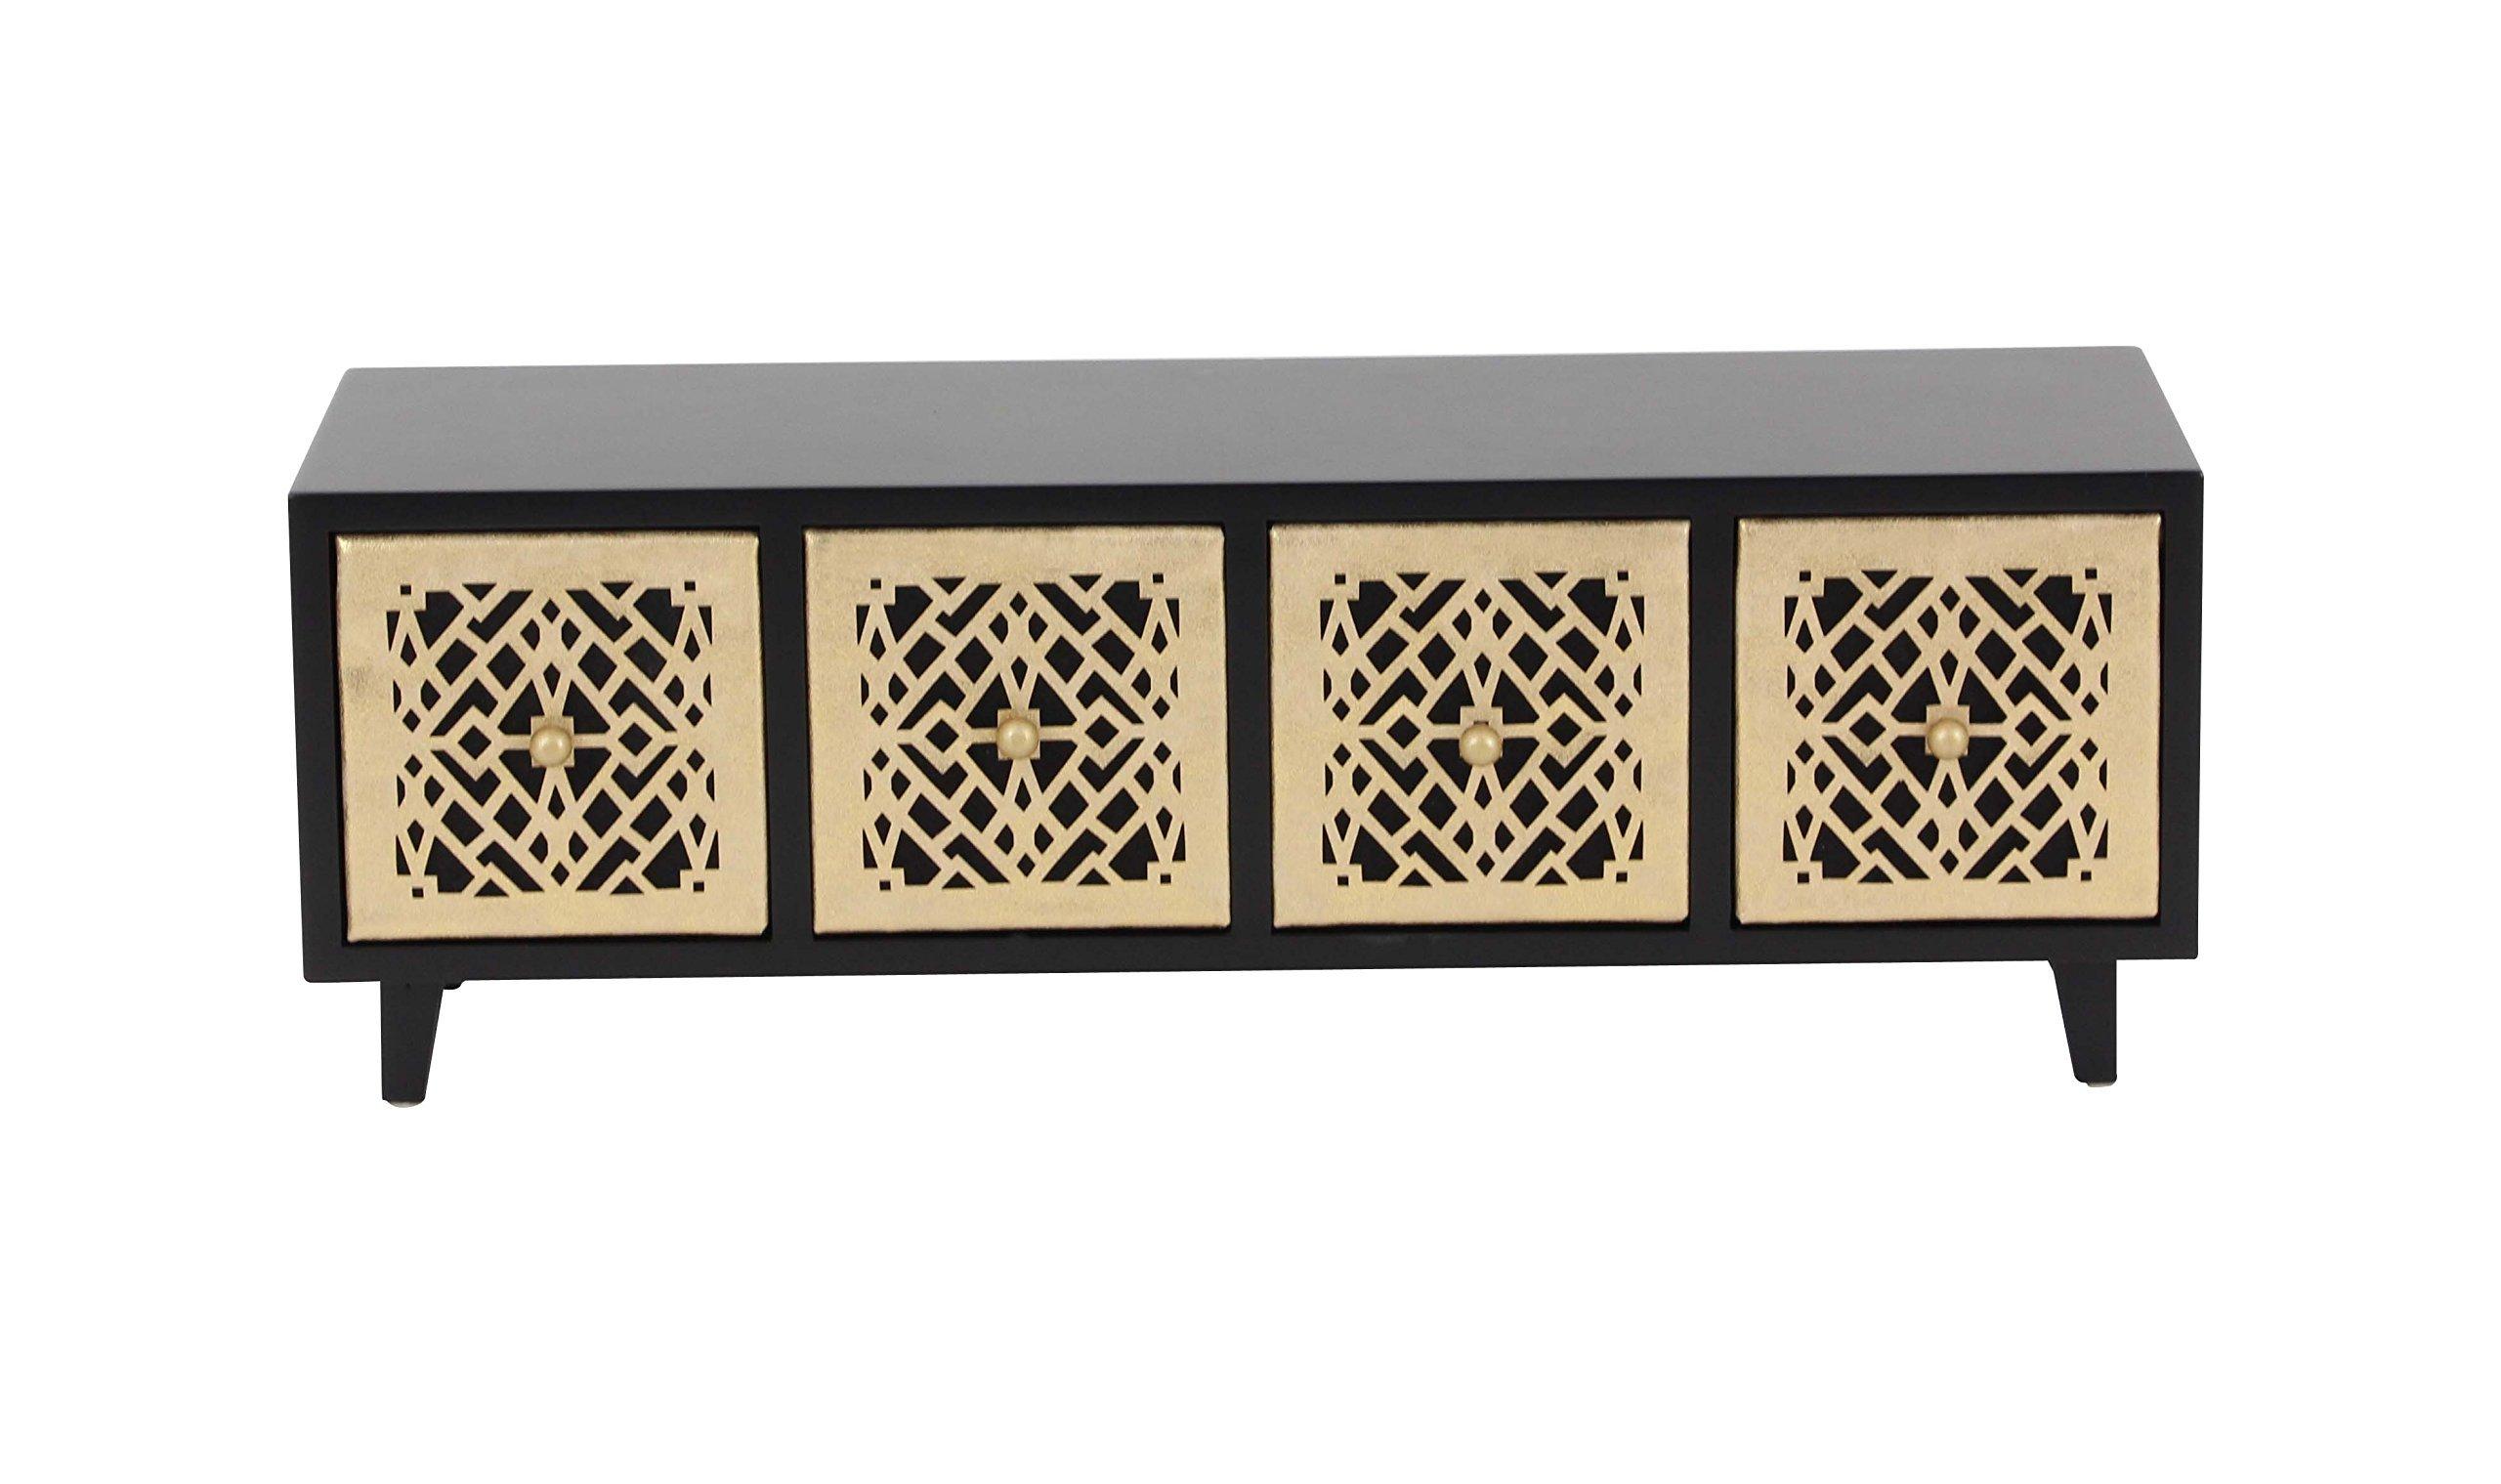 Deco 79 82186 Black Four-Drawer Rectangular Jewelry Chest, 6'' x 17'', Gold/Black